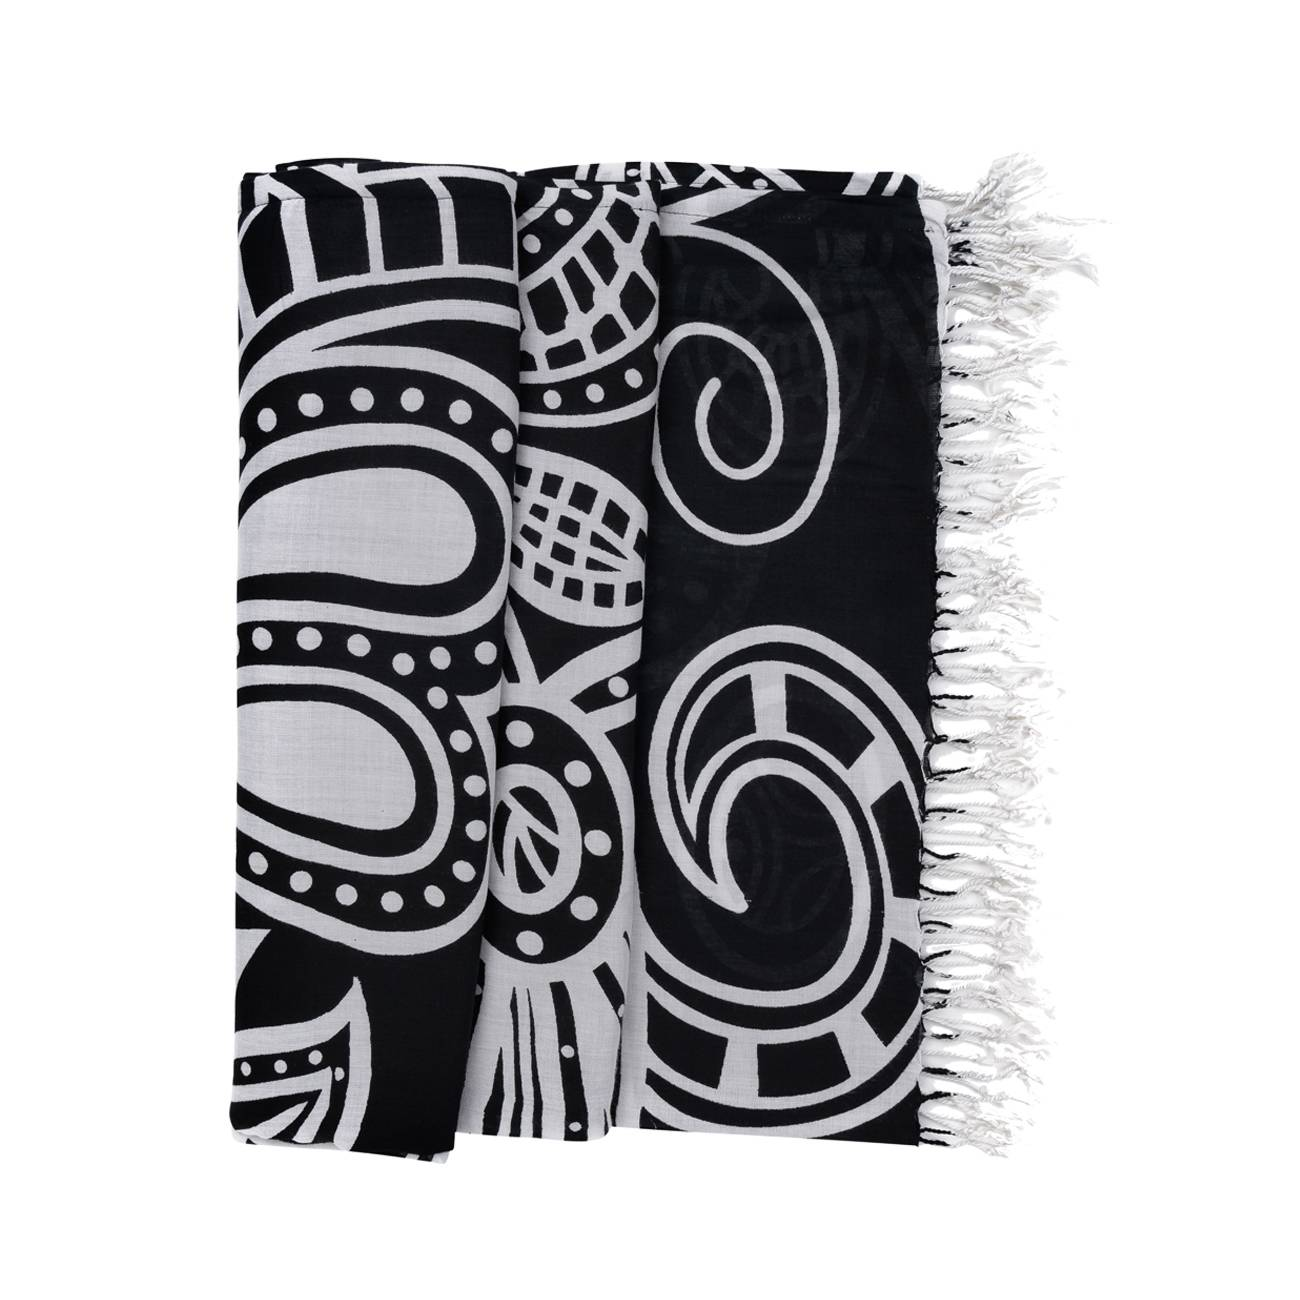 Sunny Towel imagine